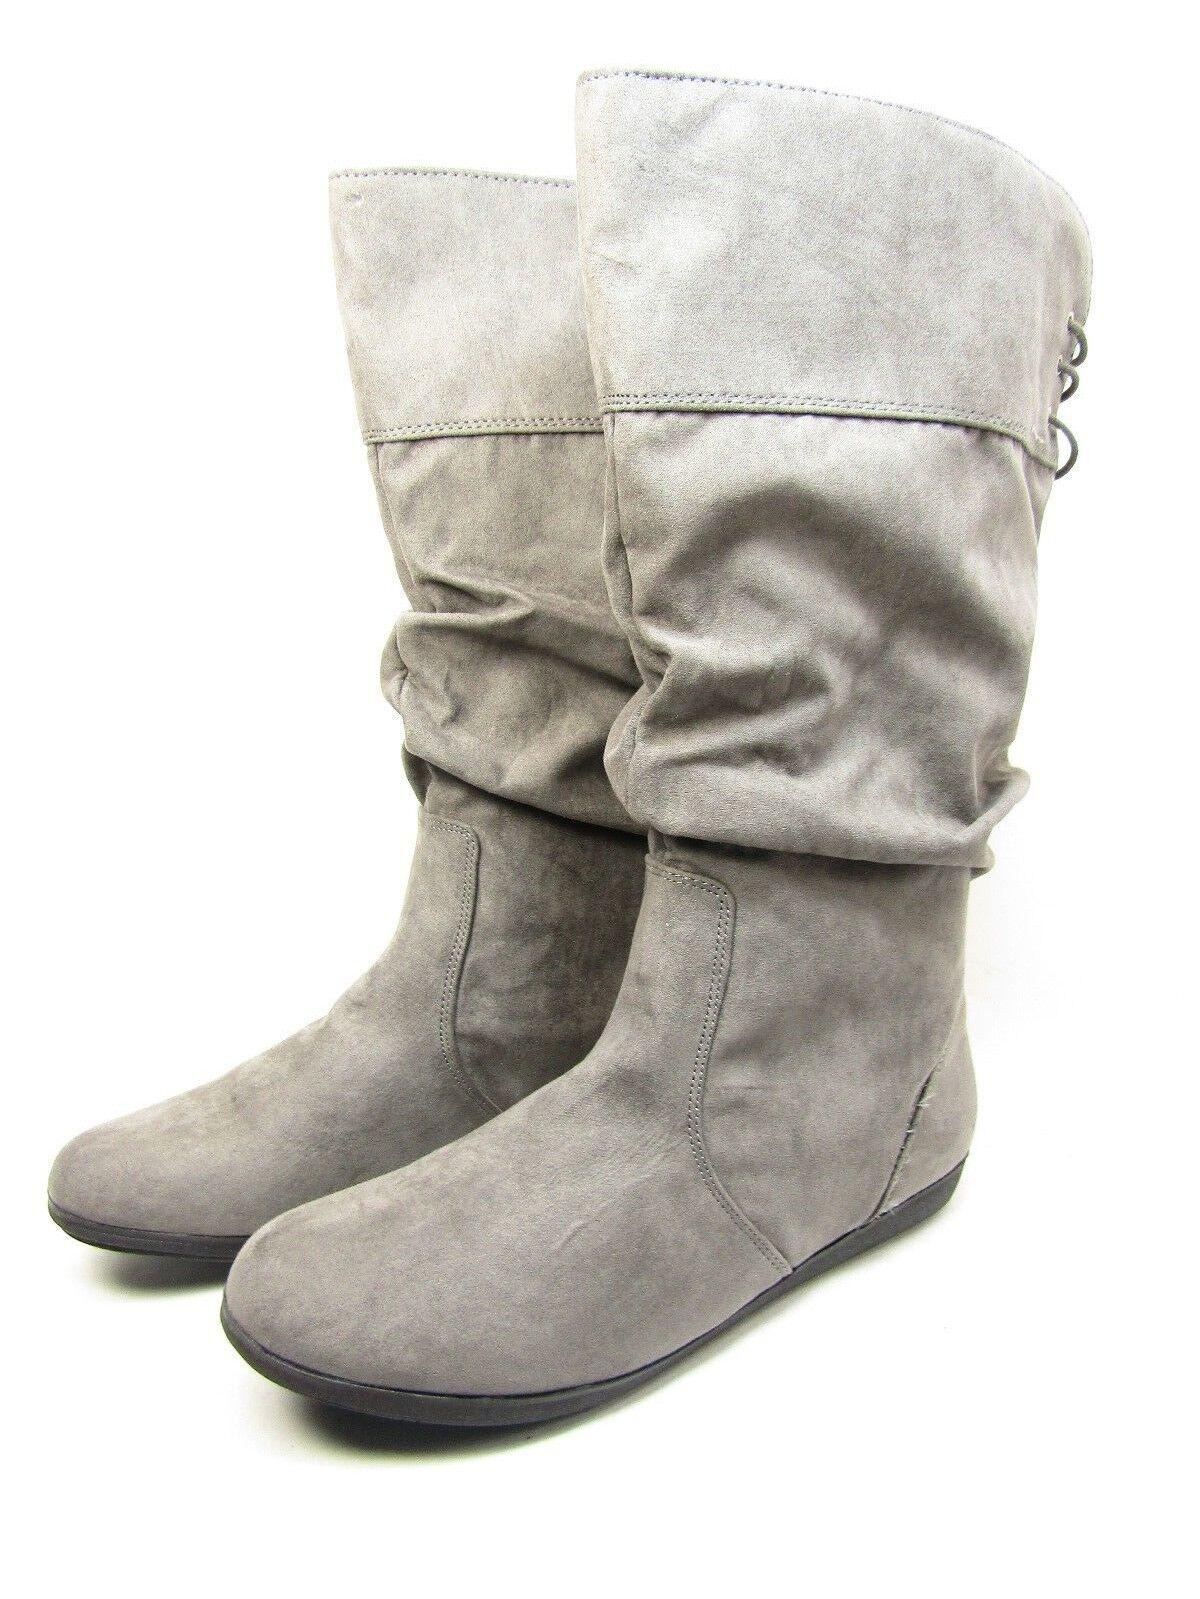 Arizona Katy WC Damenschuhe Größe Slouch Stiefel Grau Größe Damenschuhe 11M 79fbc3